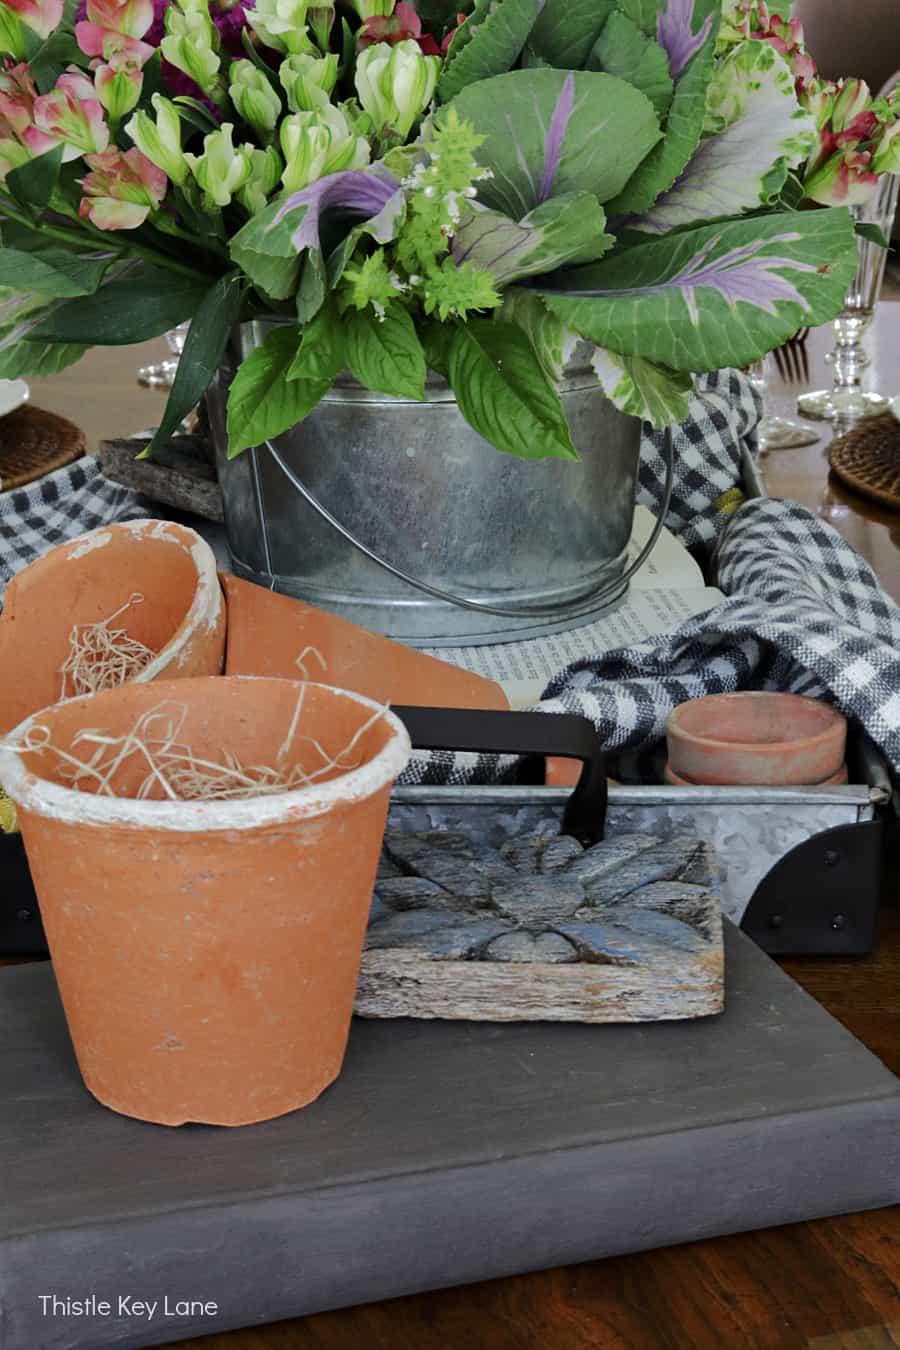 Adding wood architectural pieces for texture. Kale Flower Arrangement And Garden Tablescape.